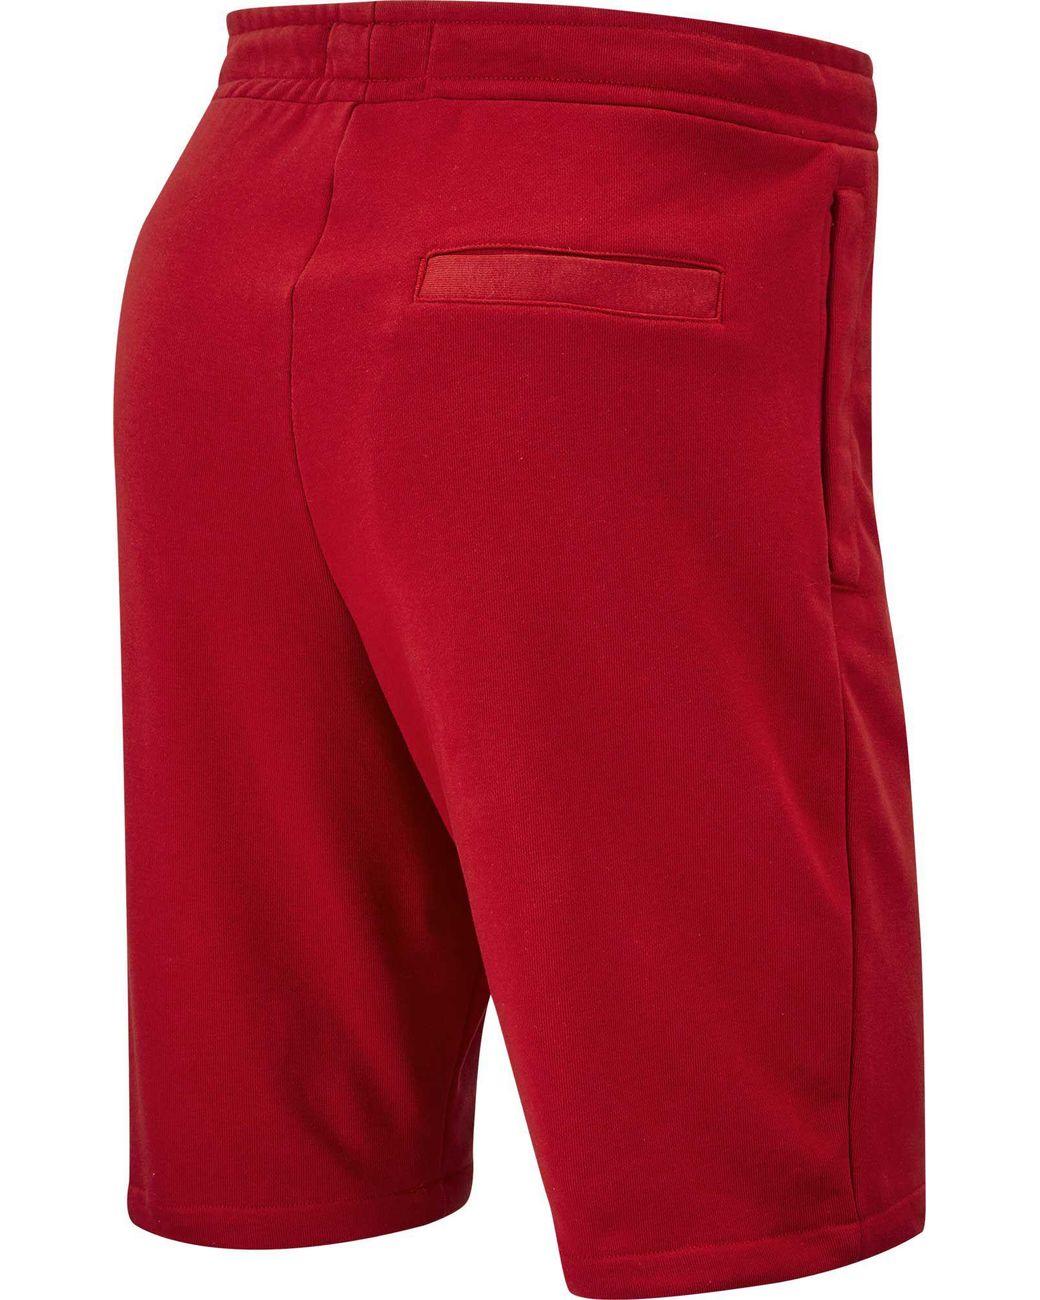 689bdff2e38f Lyst - Nike Jordan Jumpman Air Fleece Shorts in Red for Men